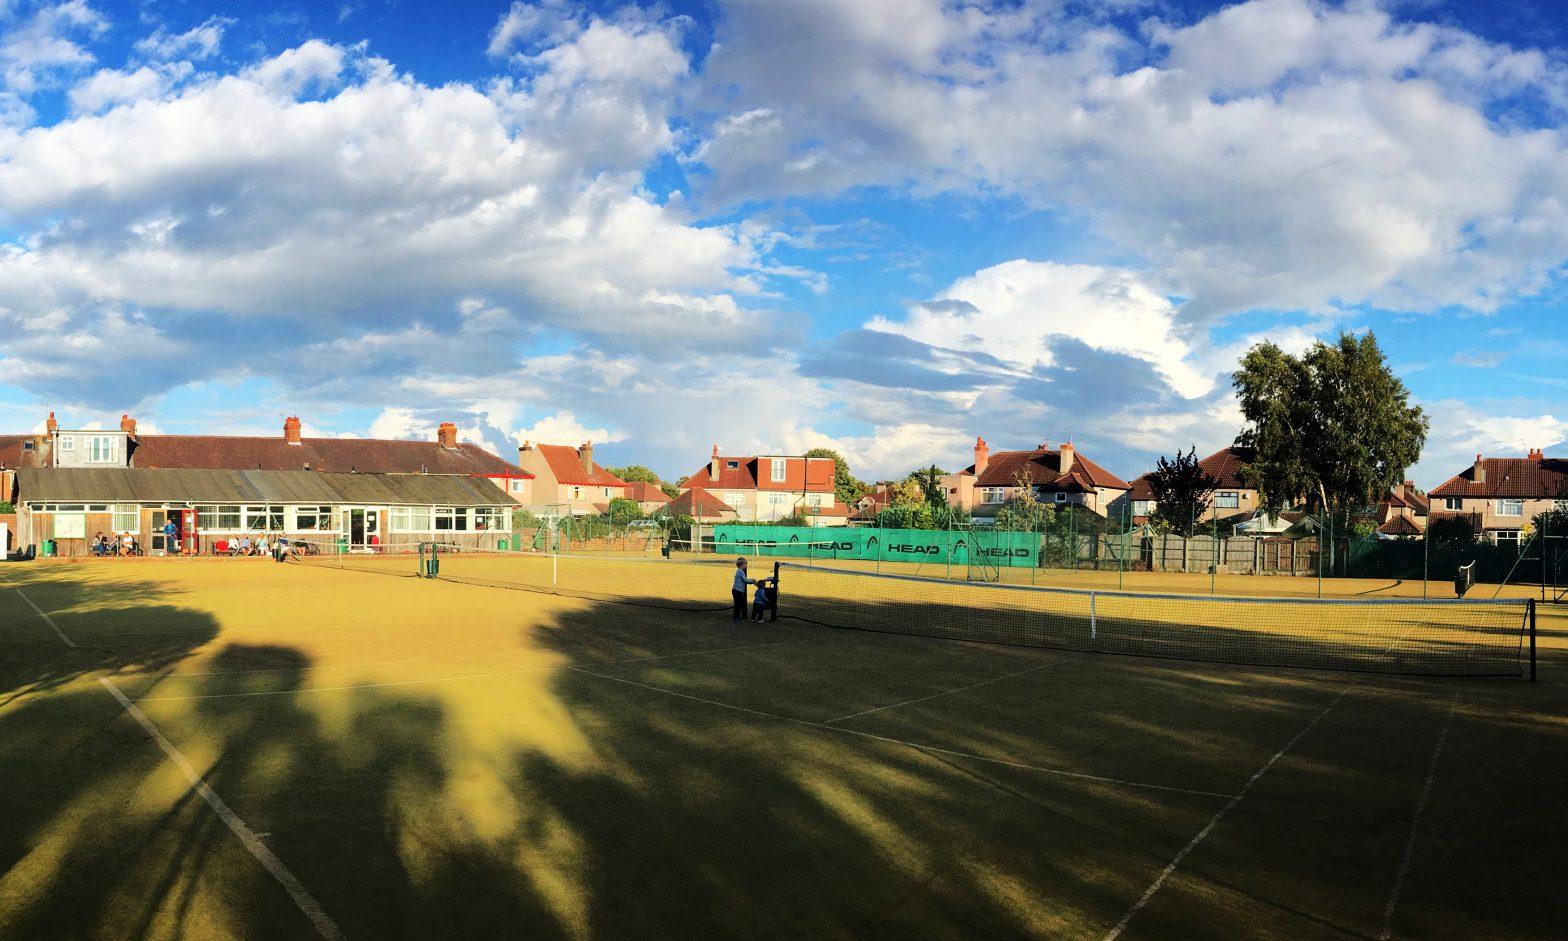 Palmerston Tennis Club